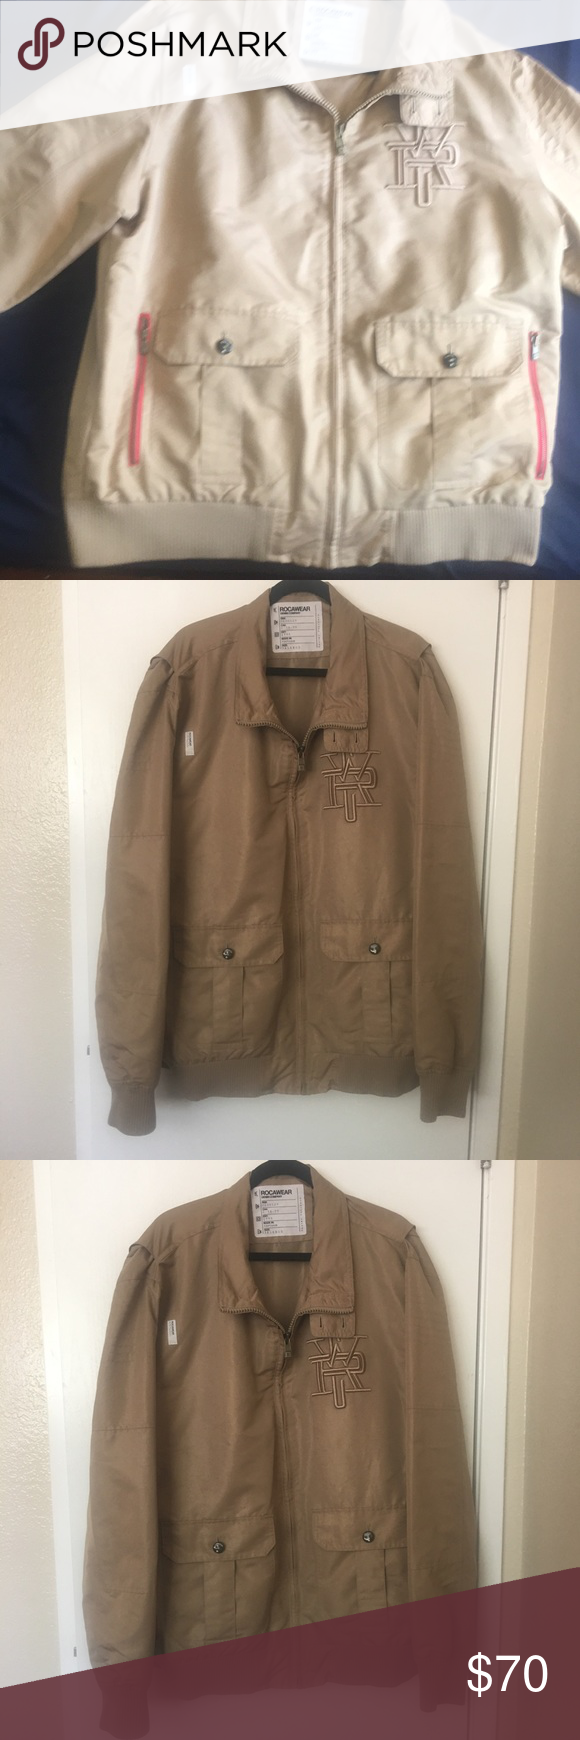 Men S Rocawear Vintage Tan Jacket Size 3xl Tan Colored Light Med Weight Jacket Rocawear Jackets Coats Tan Jacket Rocawear Jackets [ 1740 x 580 Pixel ]